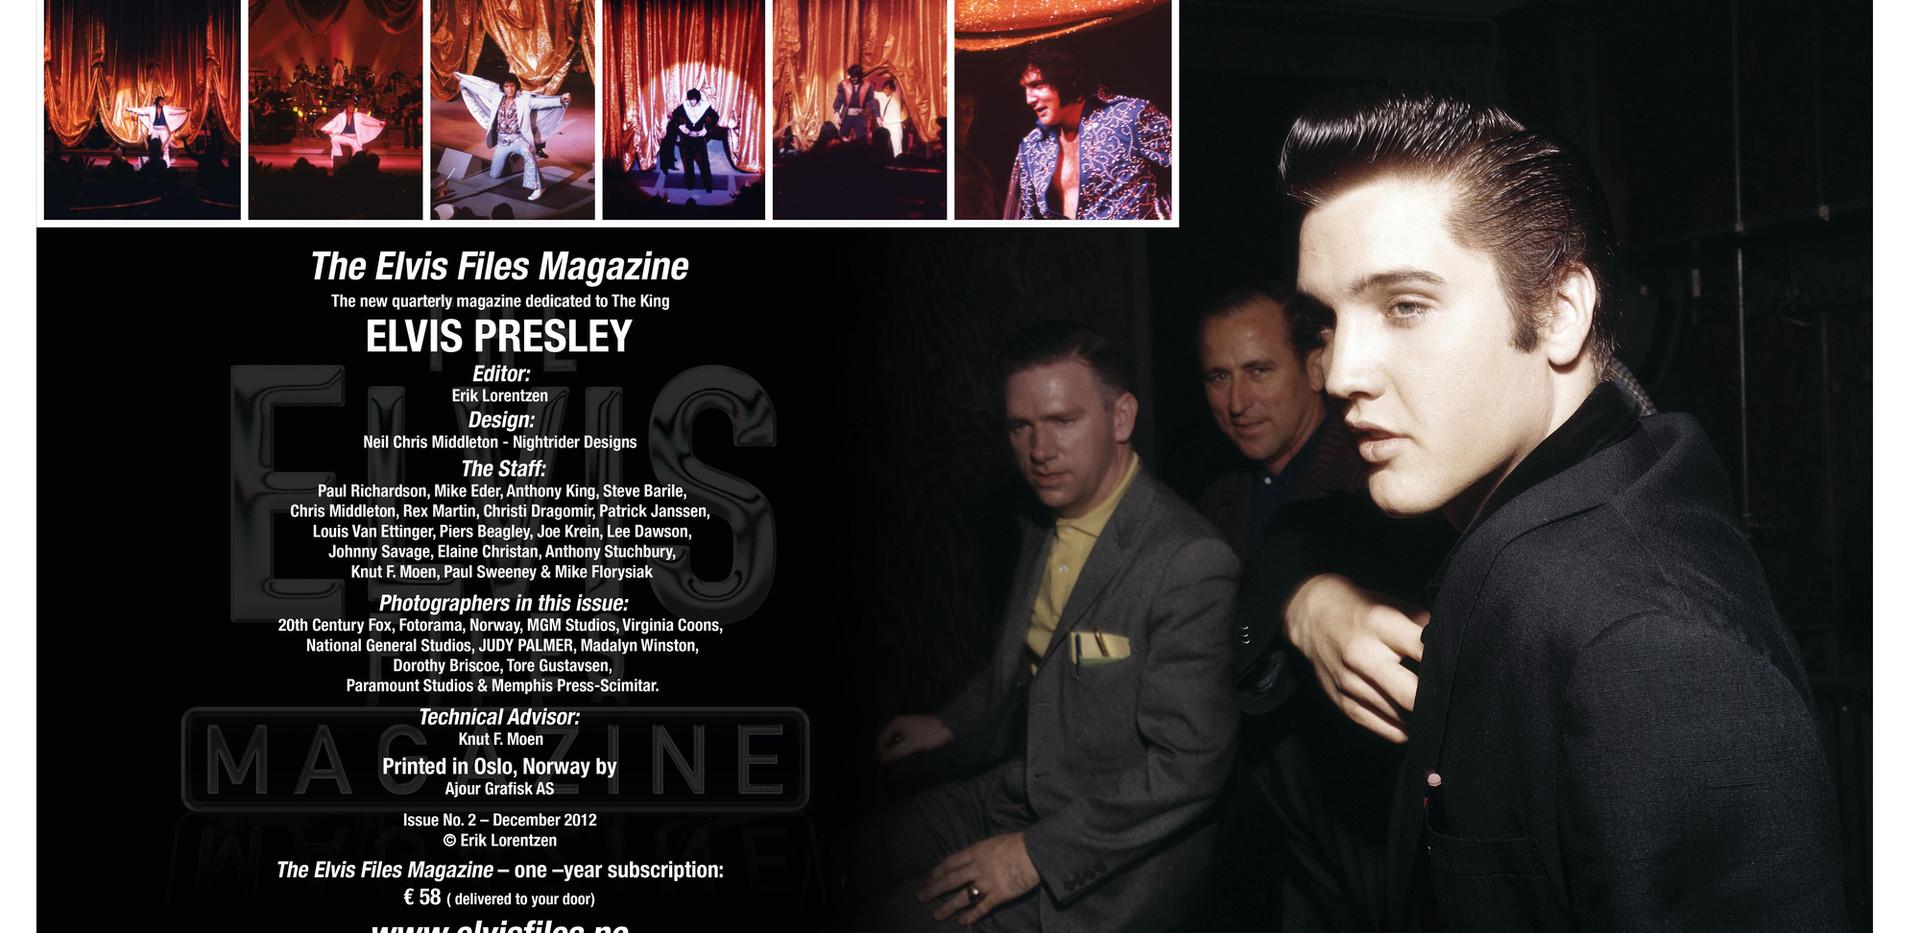 The Elvis Files magazine issue #2 (4)